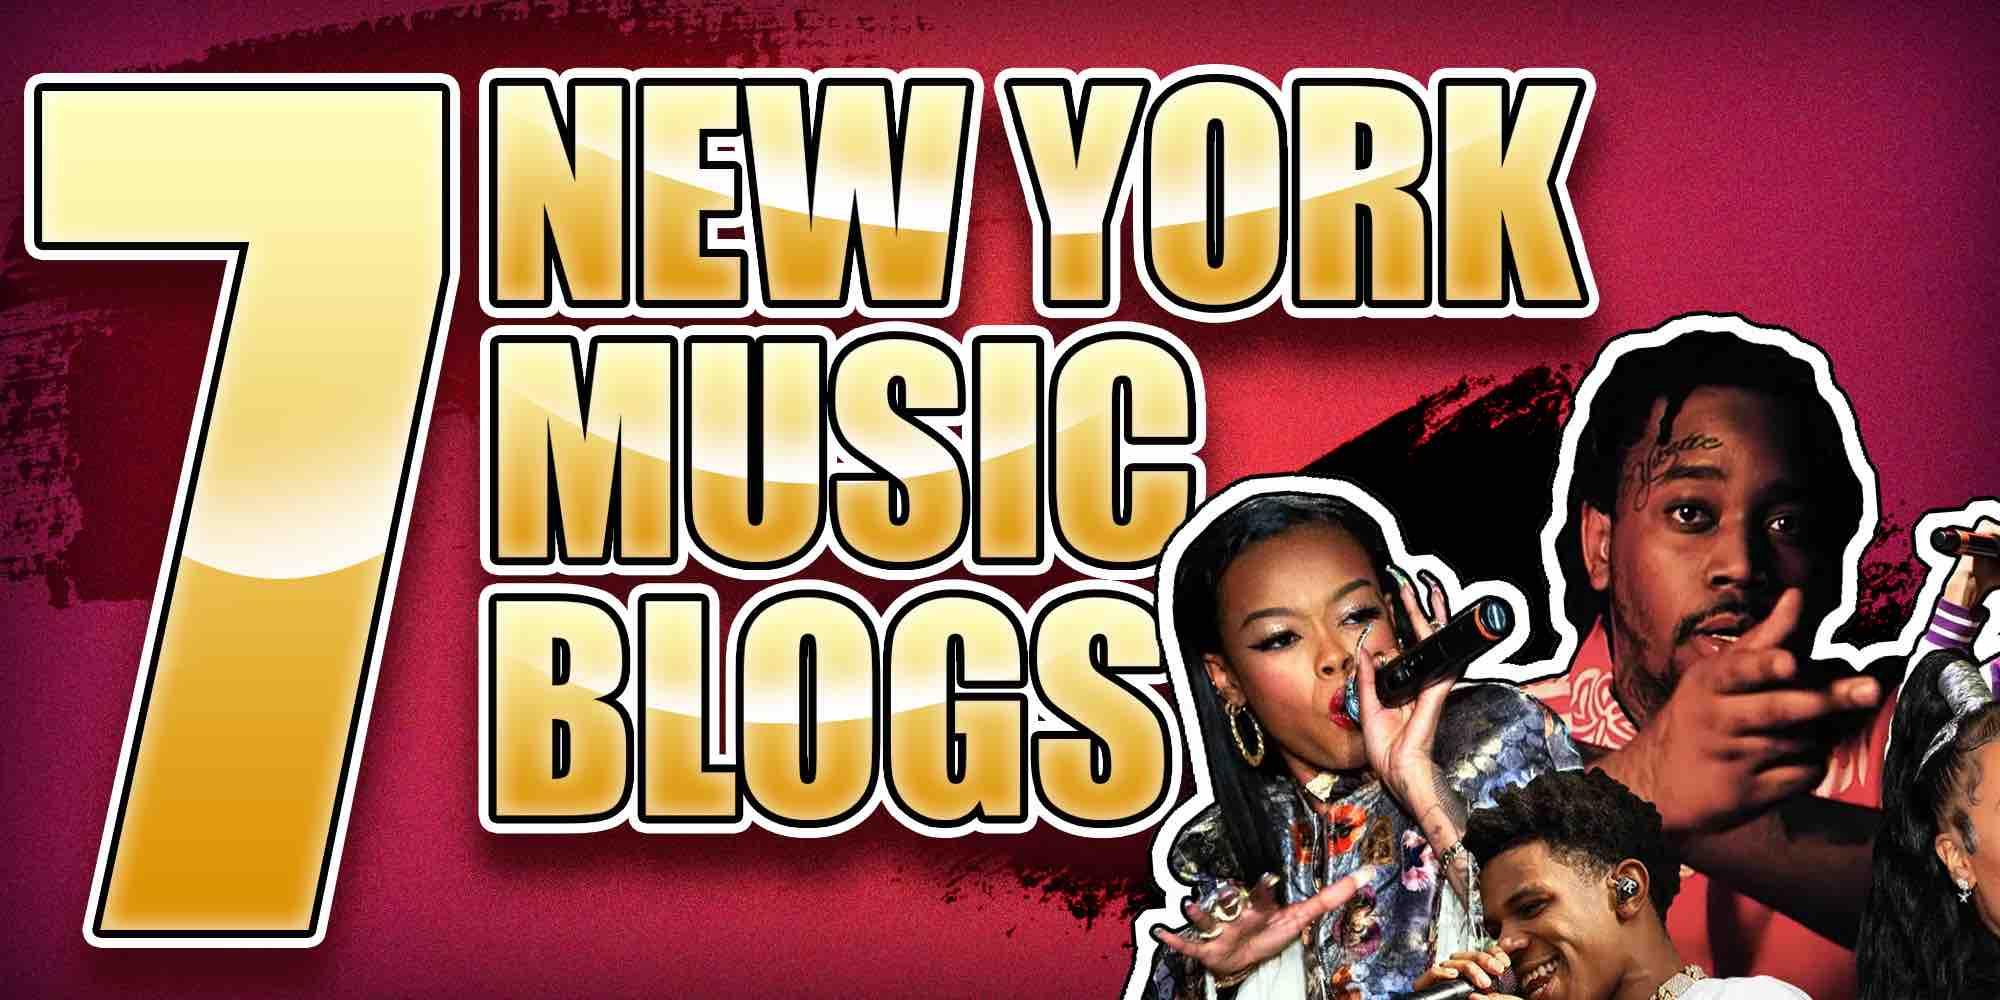 7 New York Music Blogs